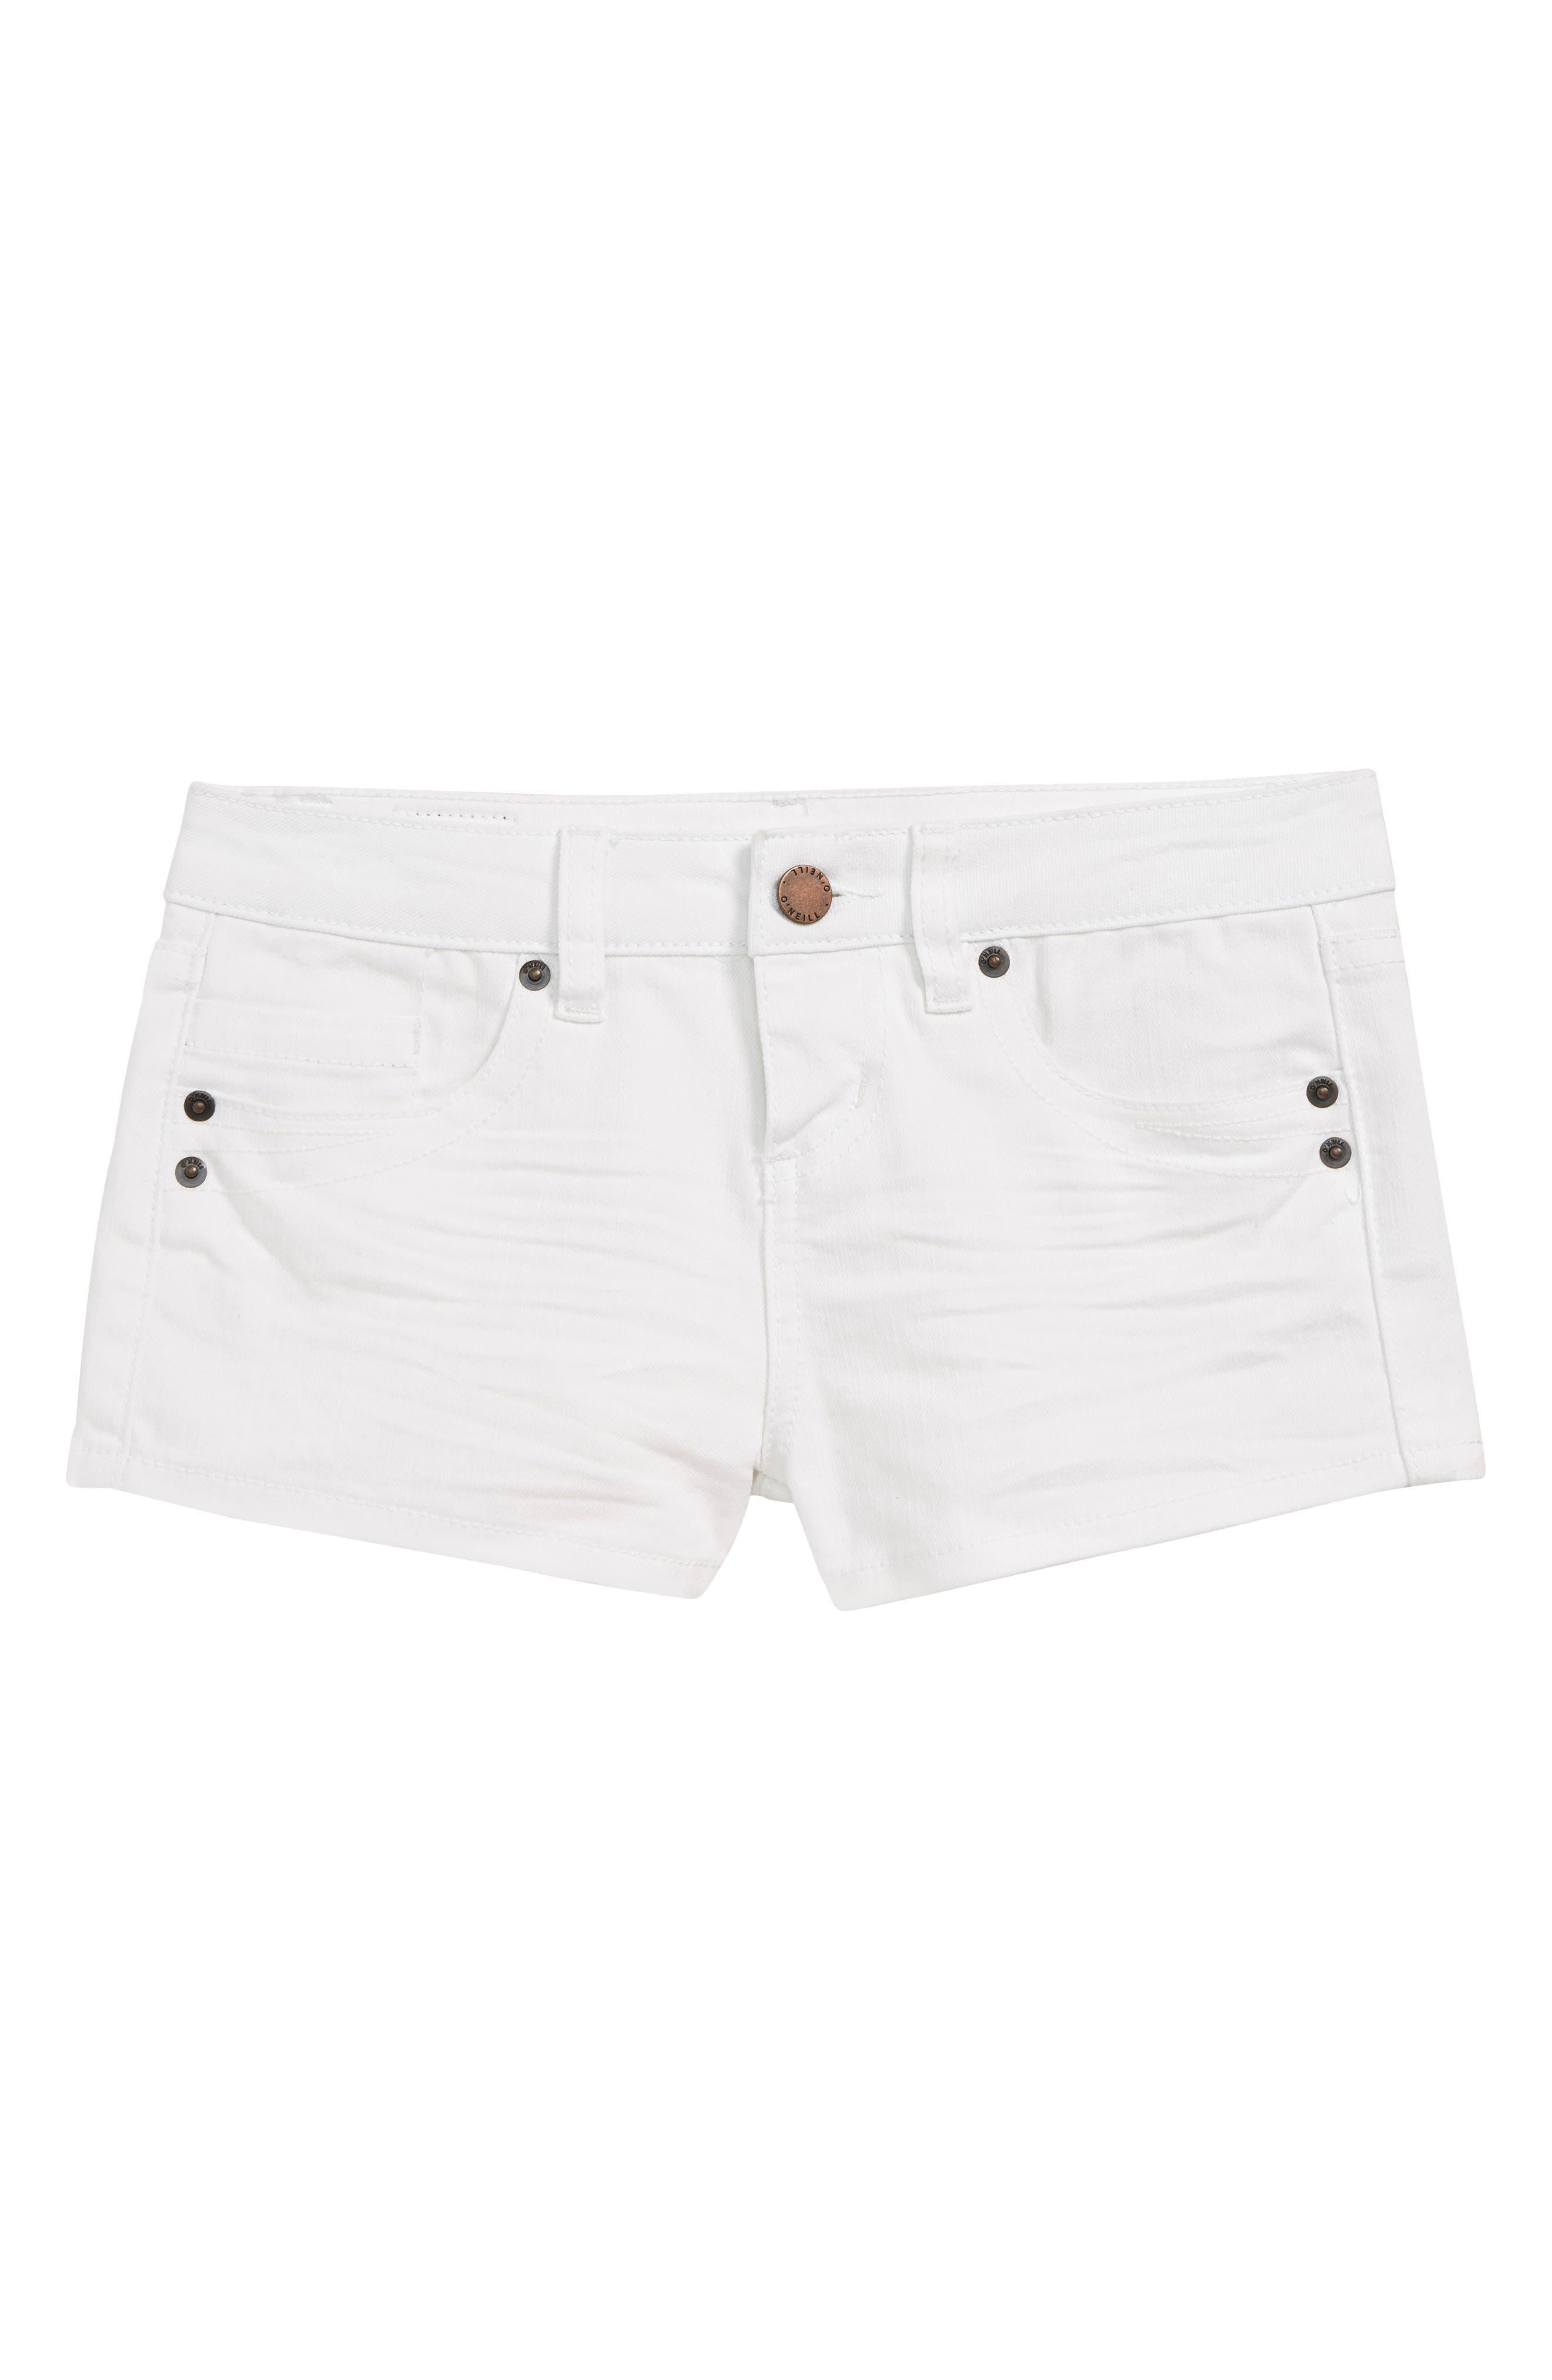 O'NEILL, Waidly Denim Shorts, Main thumbnail 1, color, WHITE